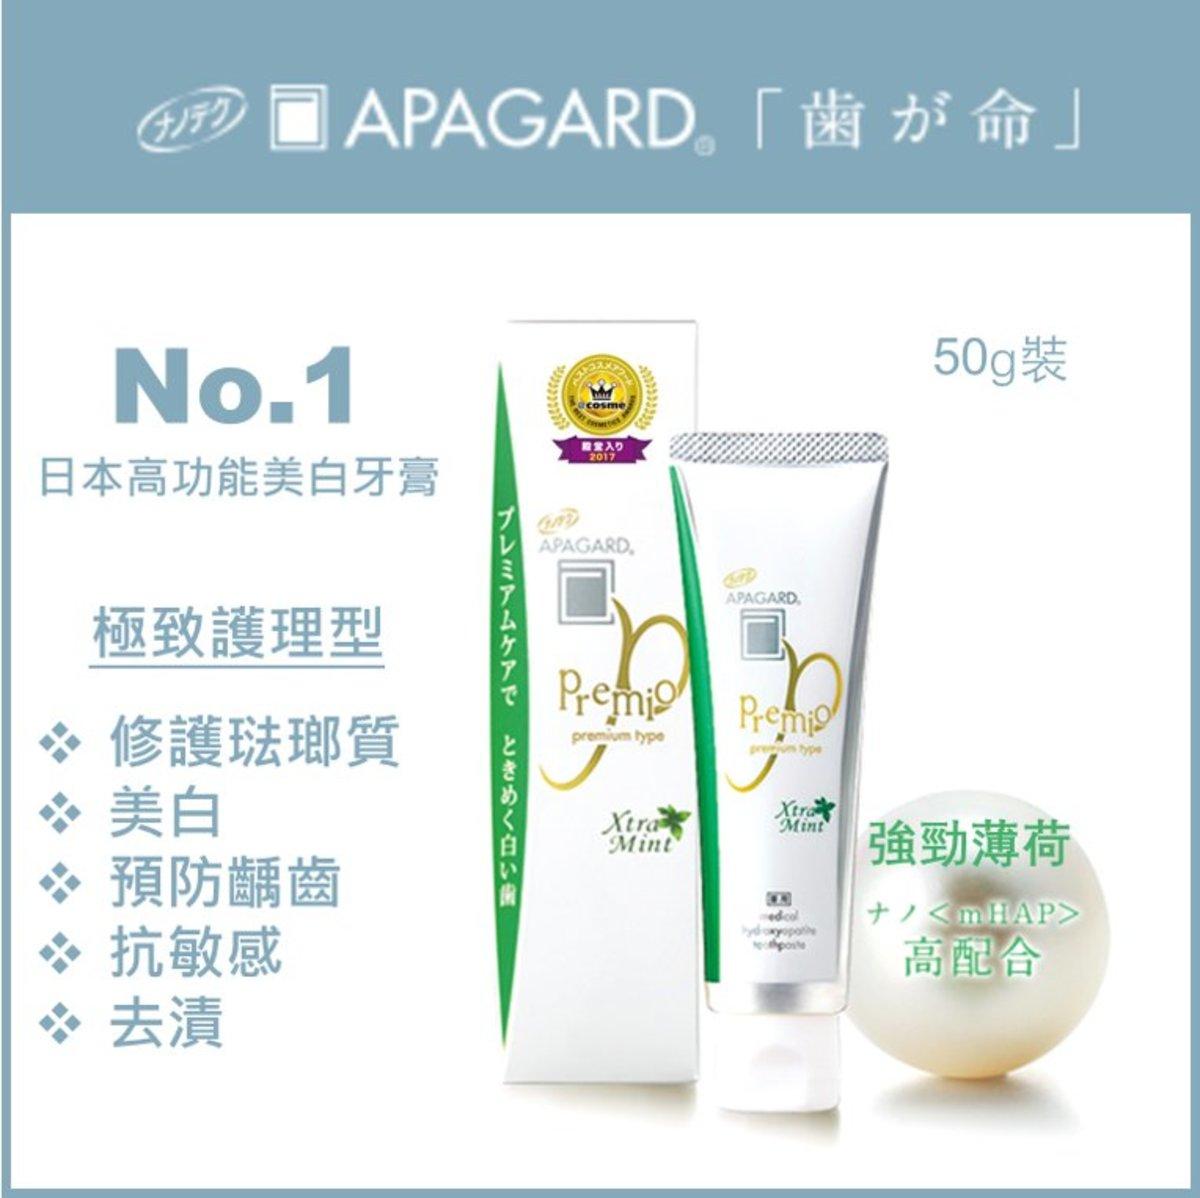 Premio 極致美白防敏修護琺瑯質牙膏 強勁薄荷味 無氟 50g